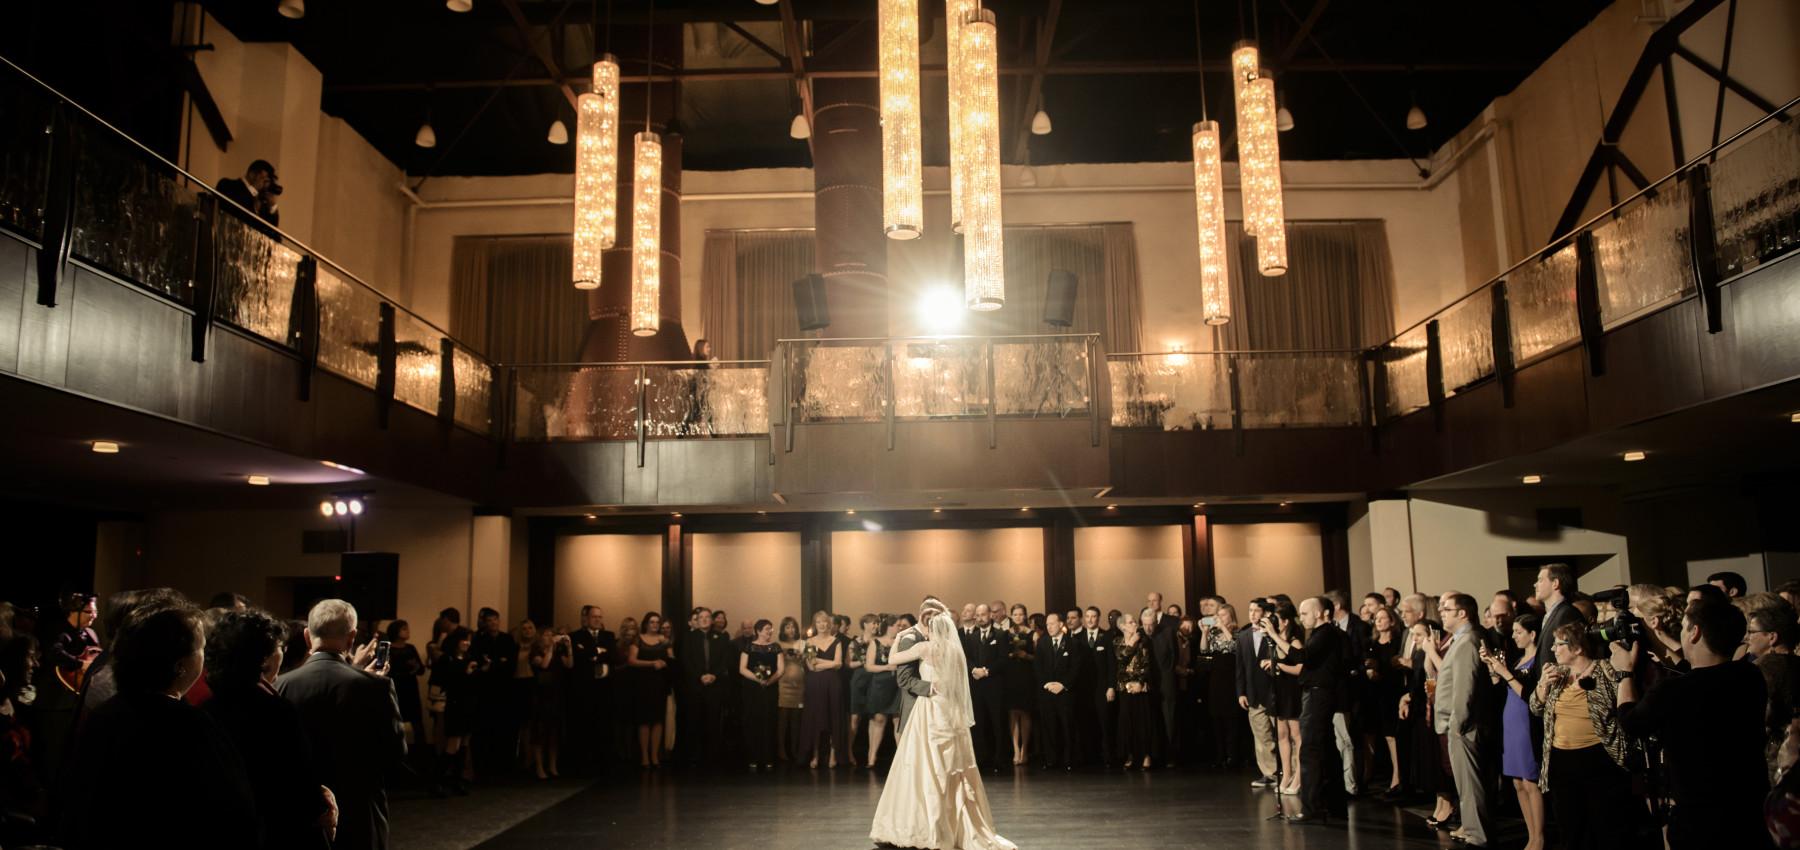 Cupola ballroom mezzanine phoenixville foundry - American history x dinner table scene ...